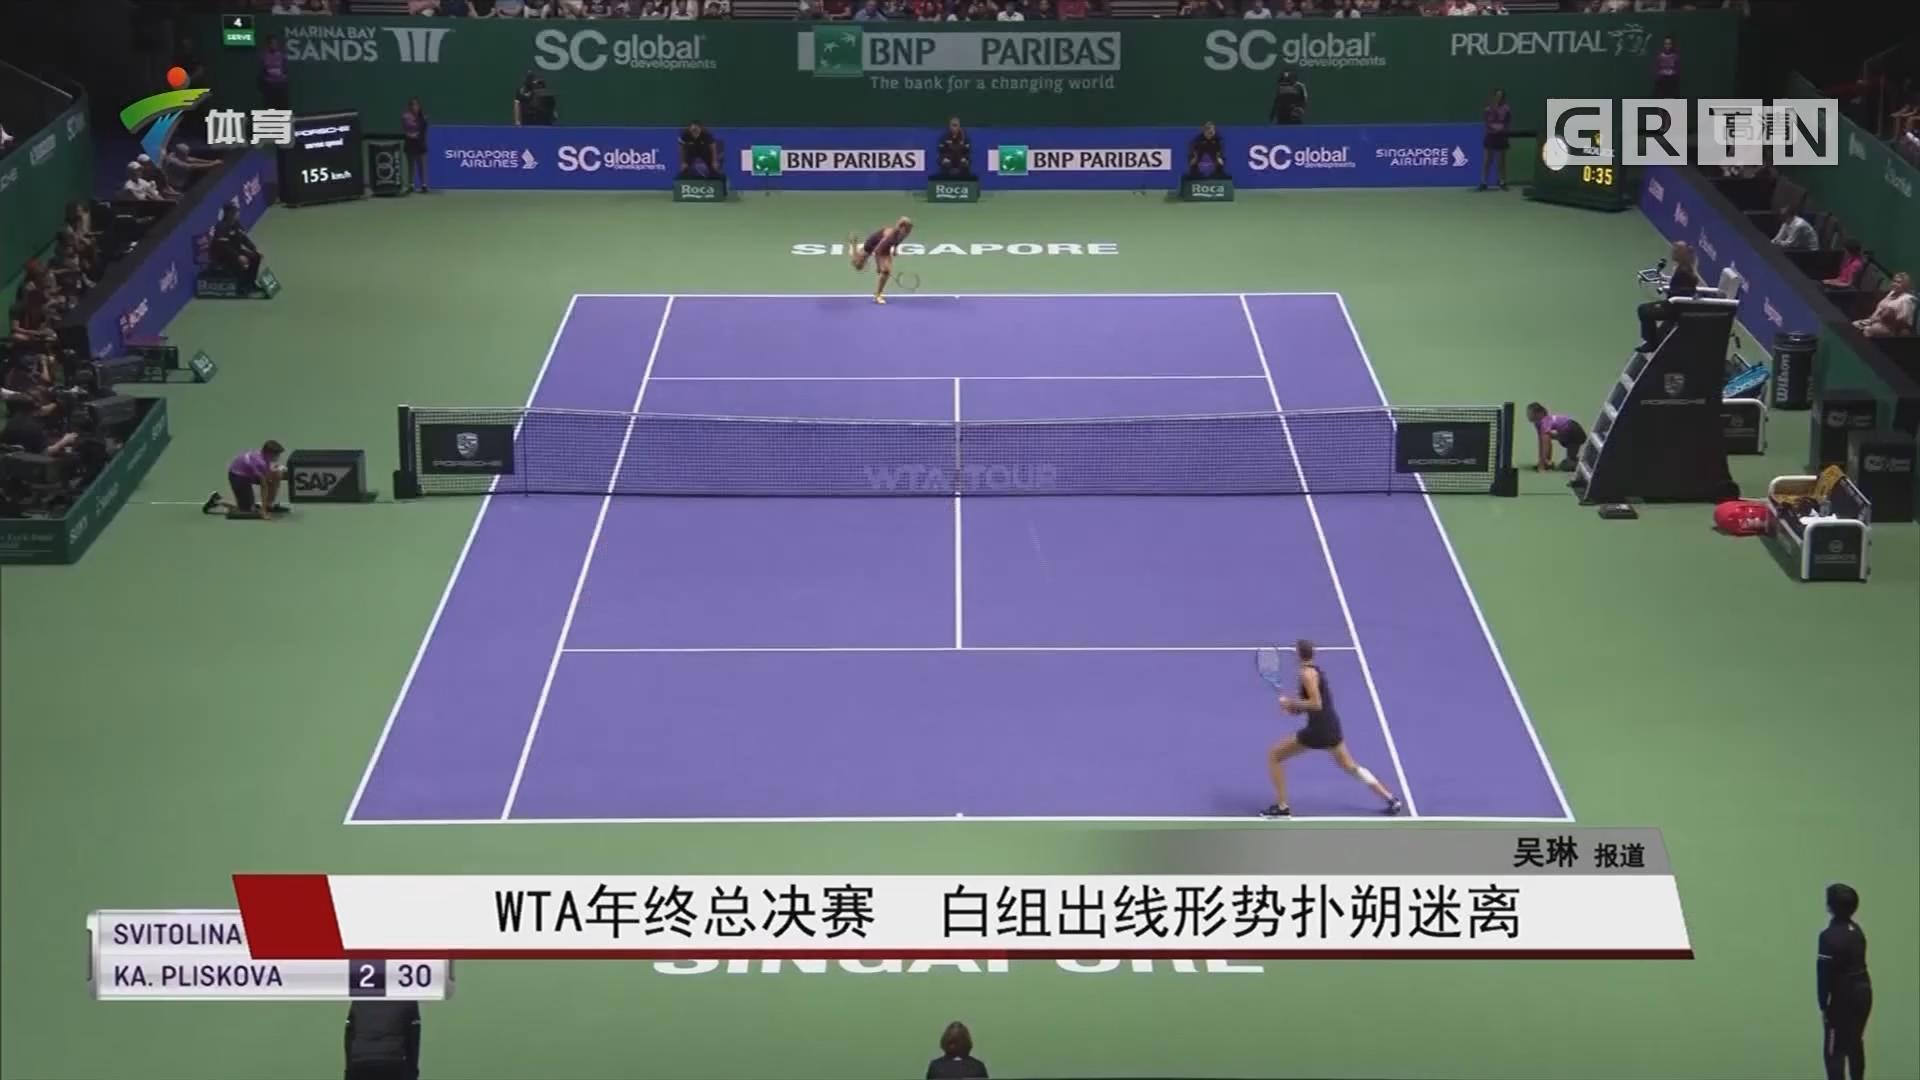 WTA年终总决赛 白组出线形势扑朔迷离